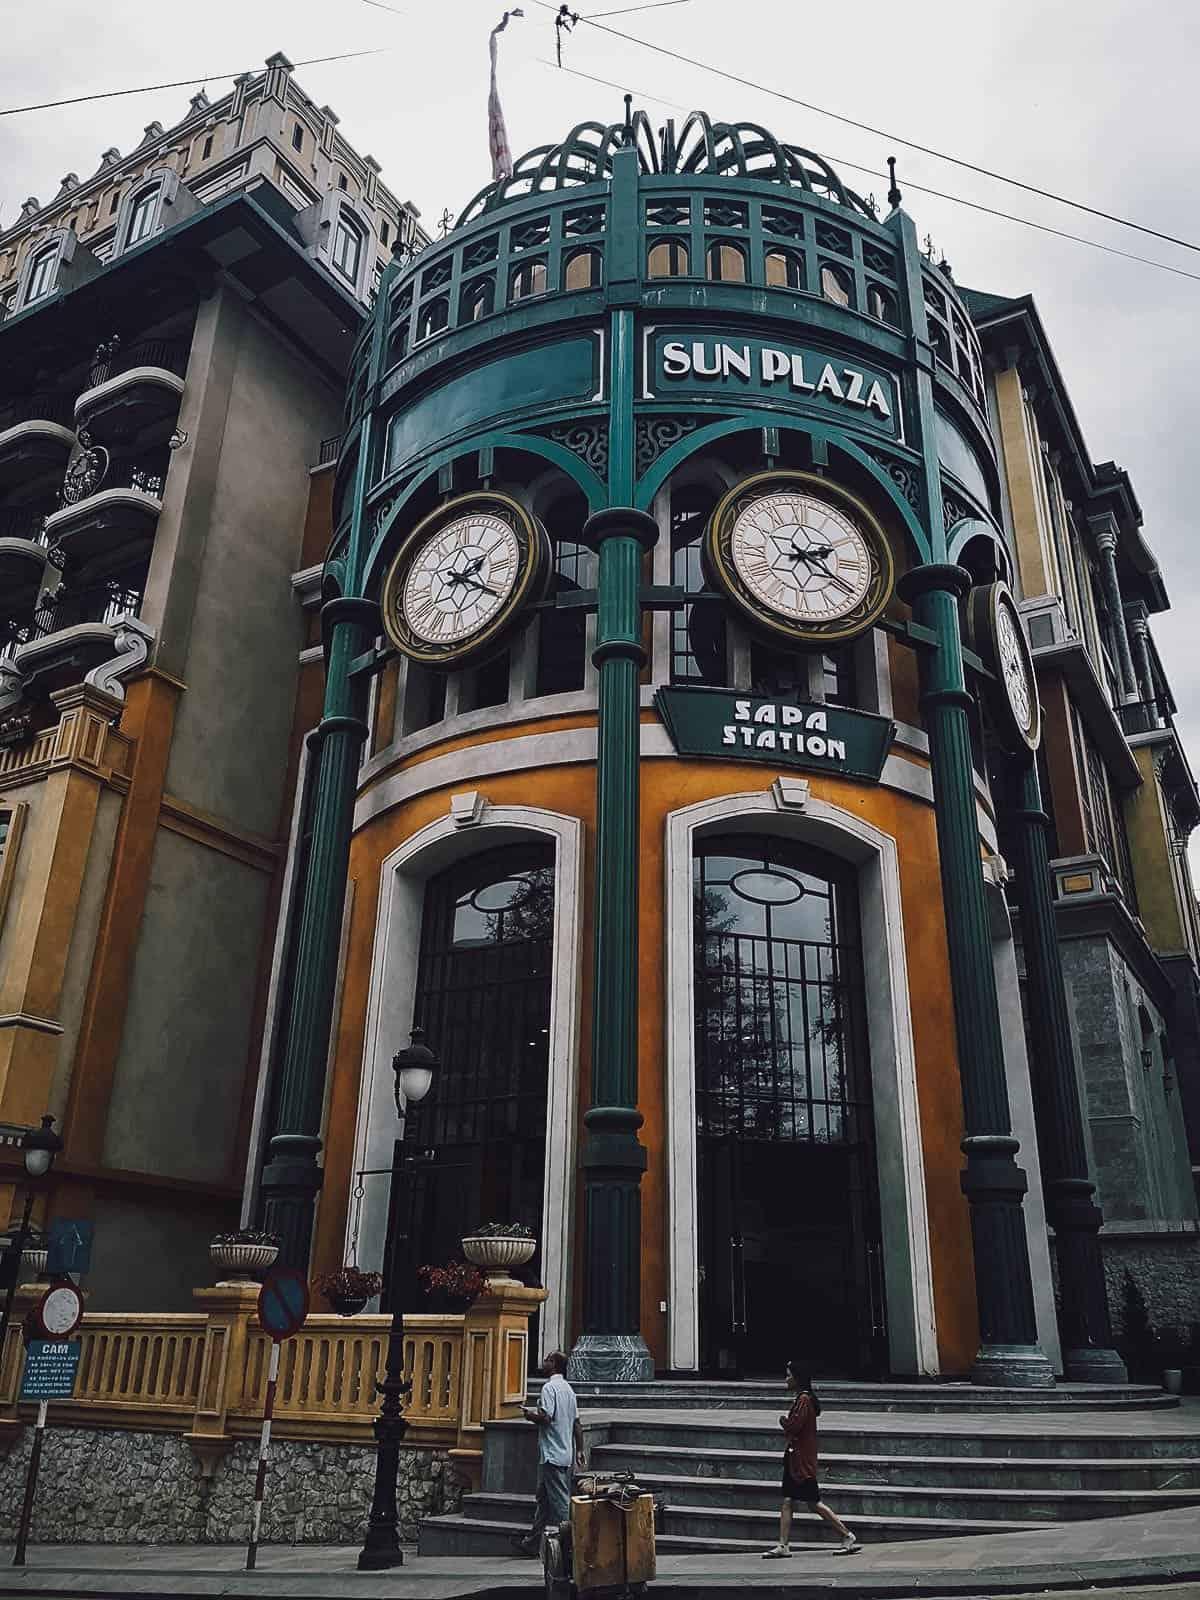 Exterior of Sapa Station